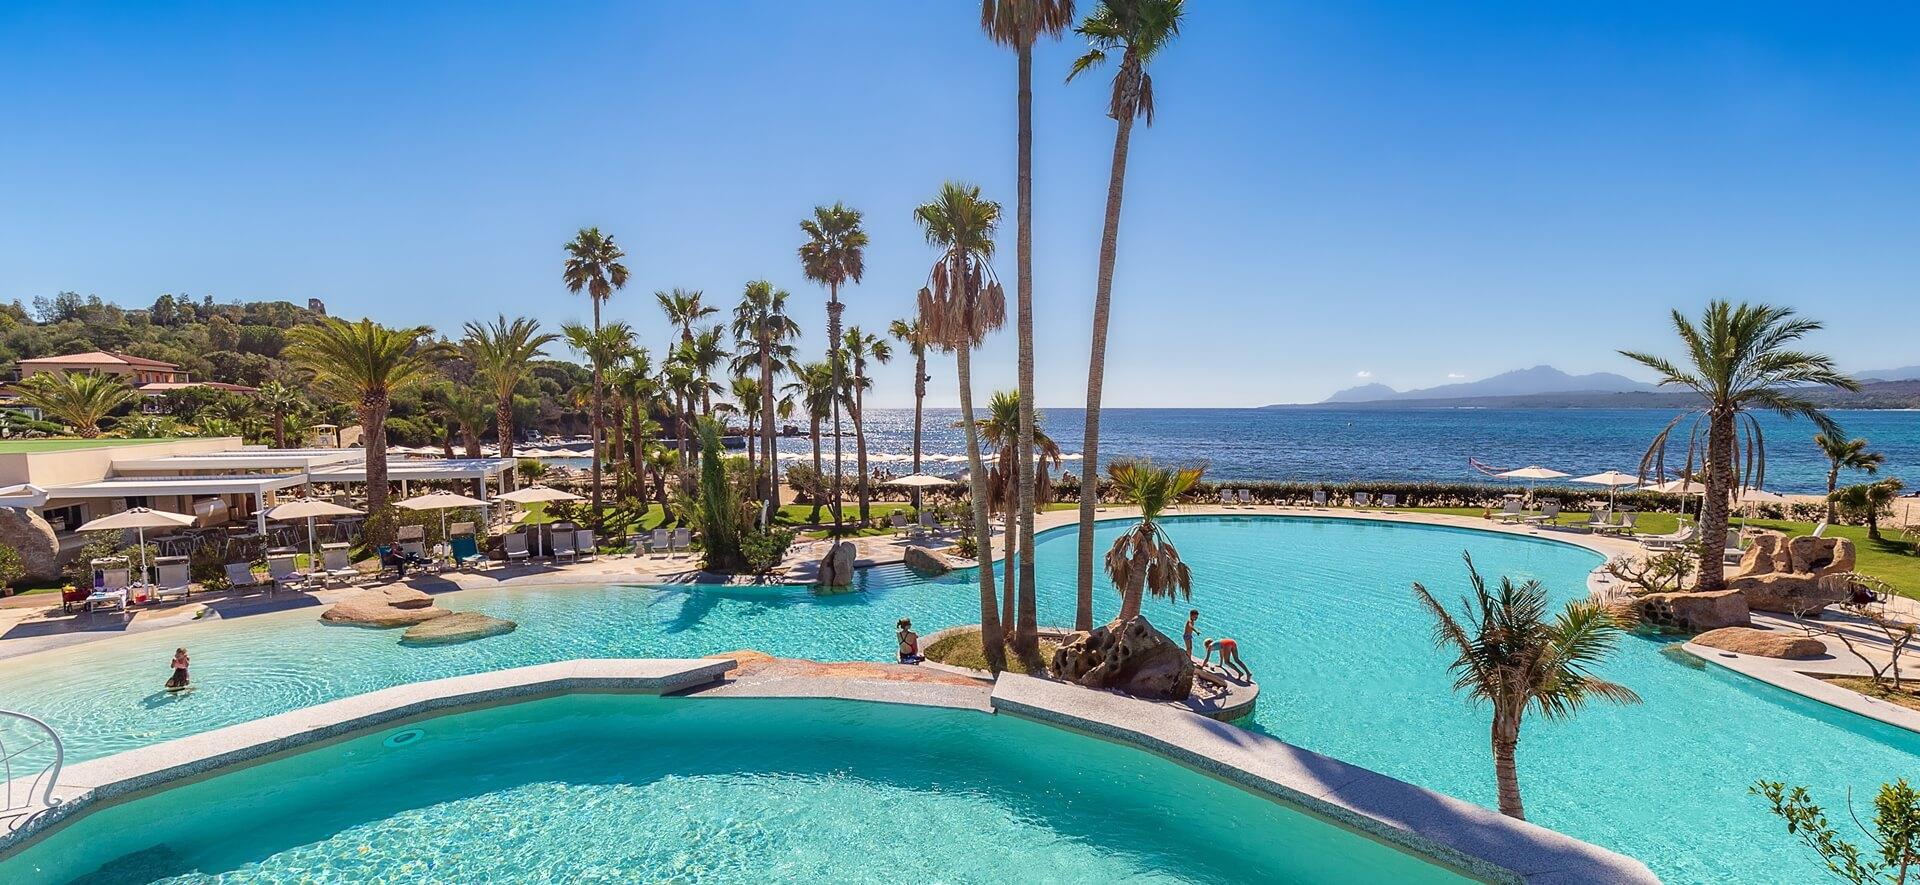 hotel-piscina-tropicale-sardegna